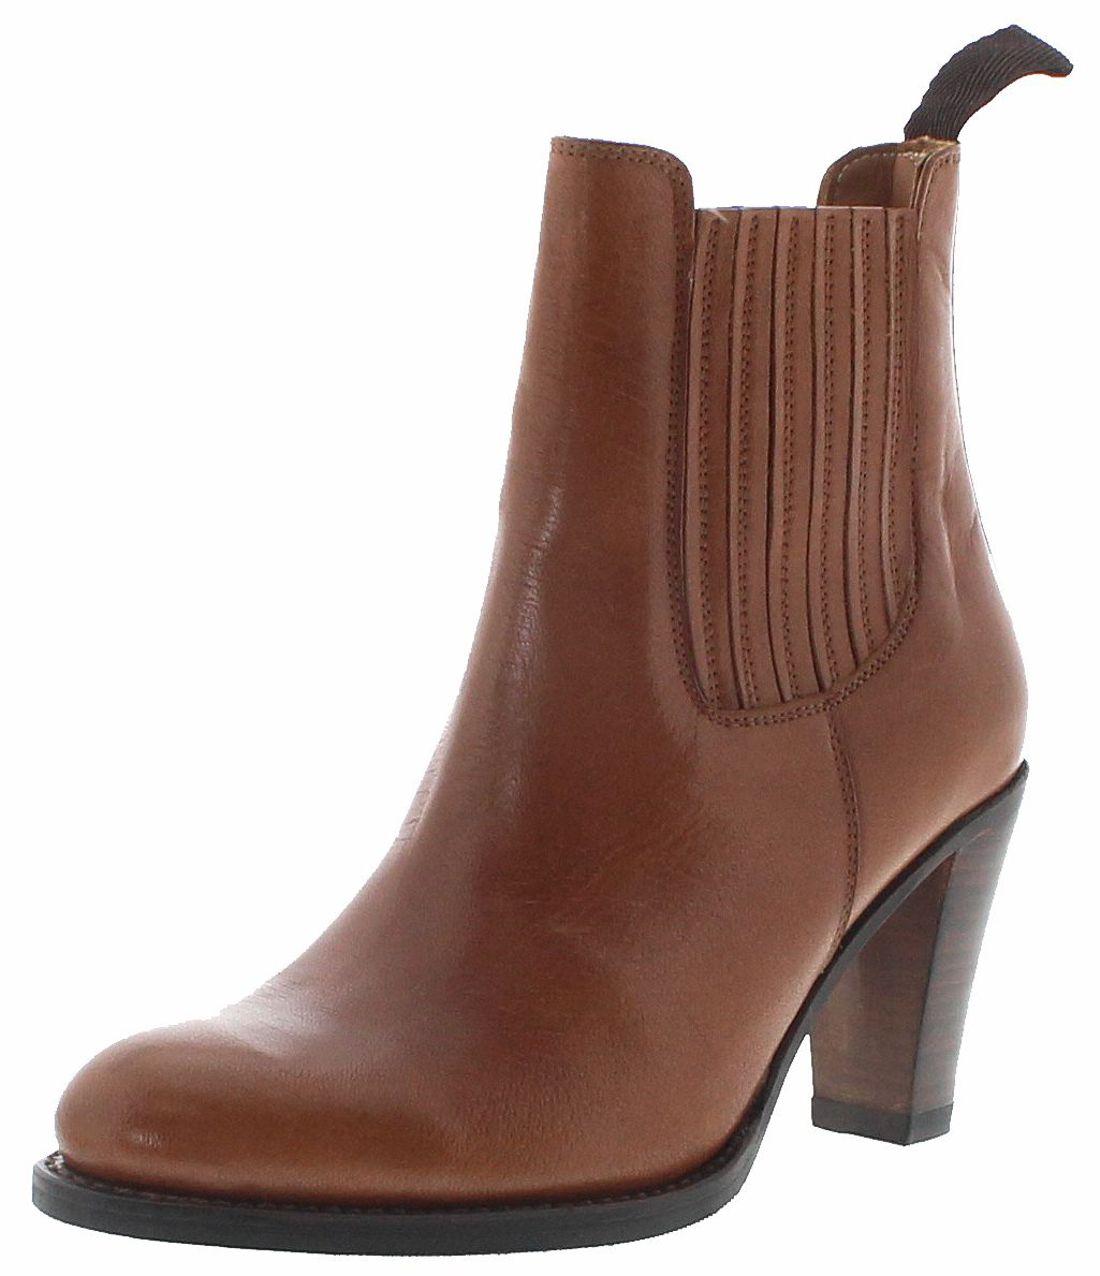 FB Fashion Boots SOFIA Cuero Ladies Bootee - brown